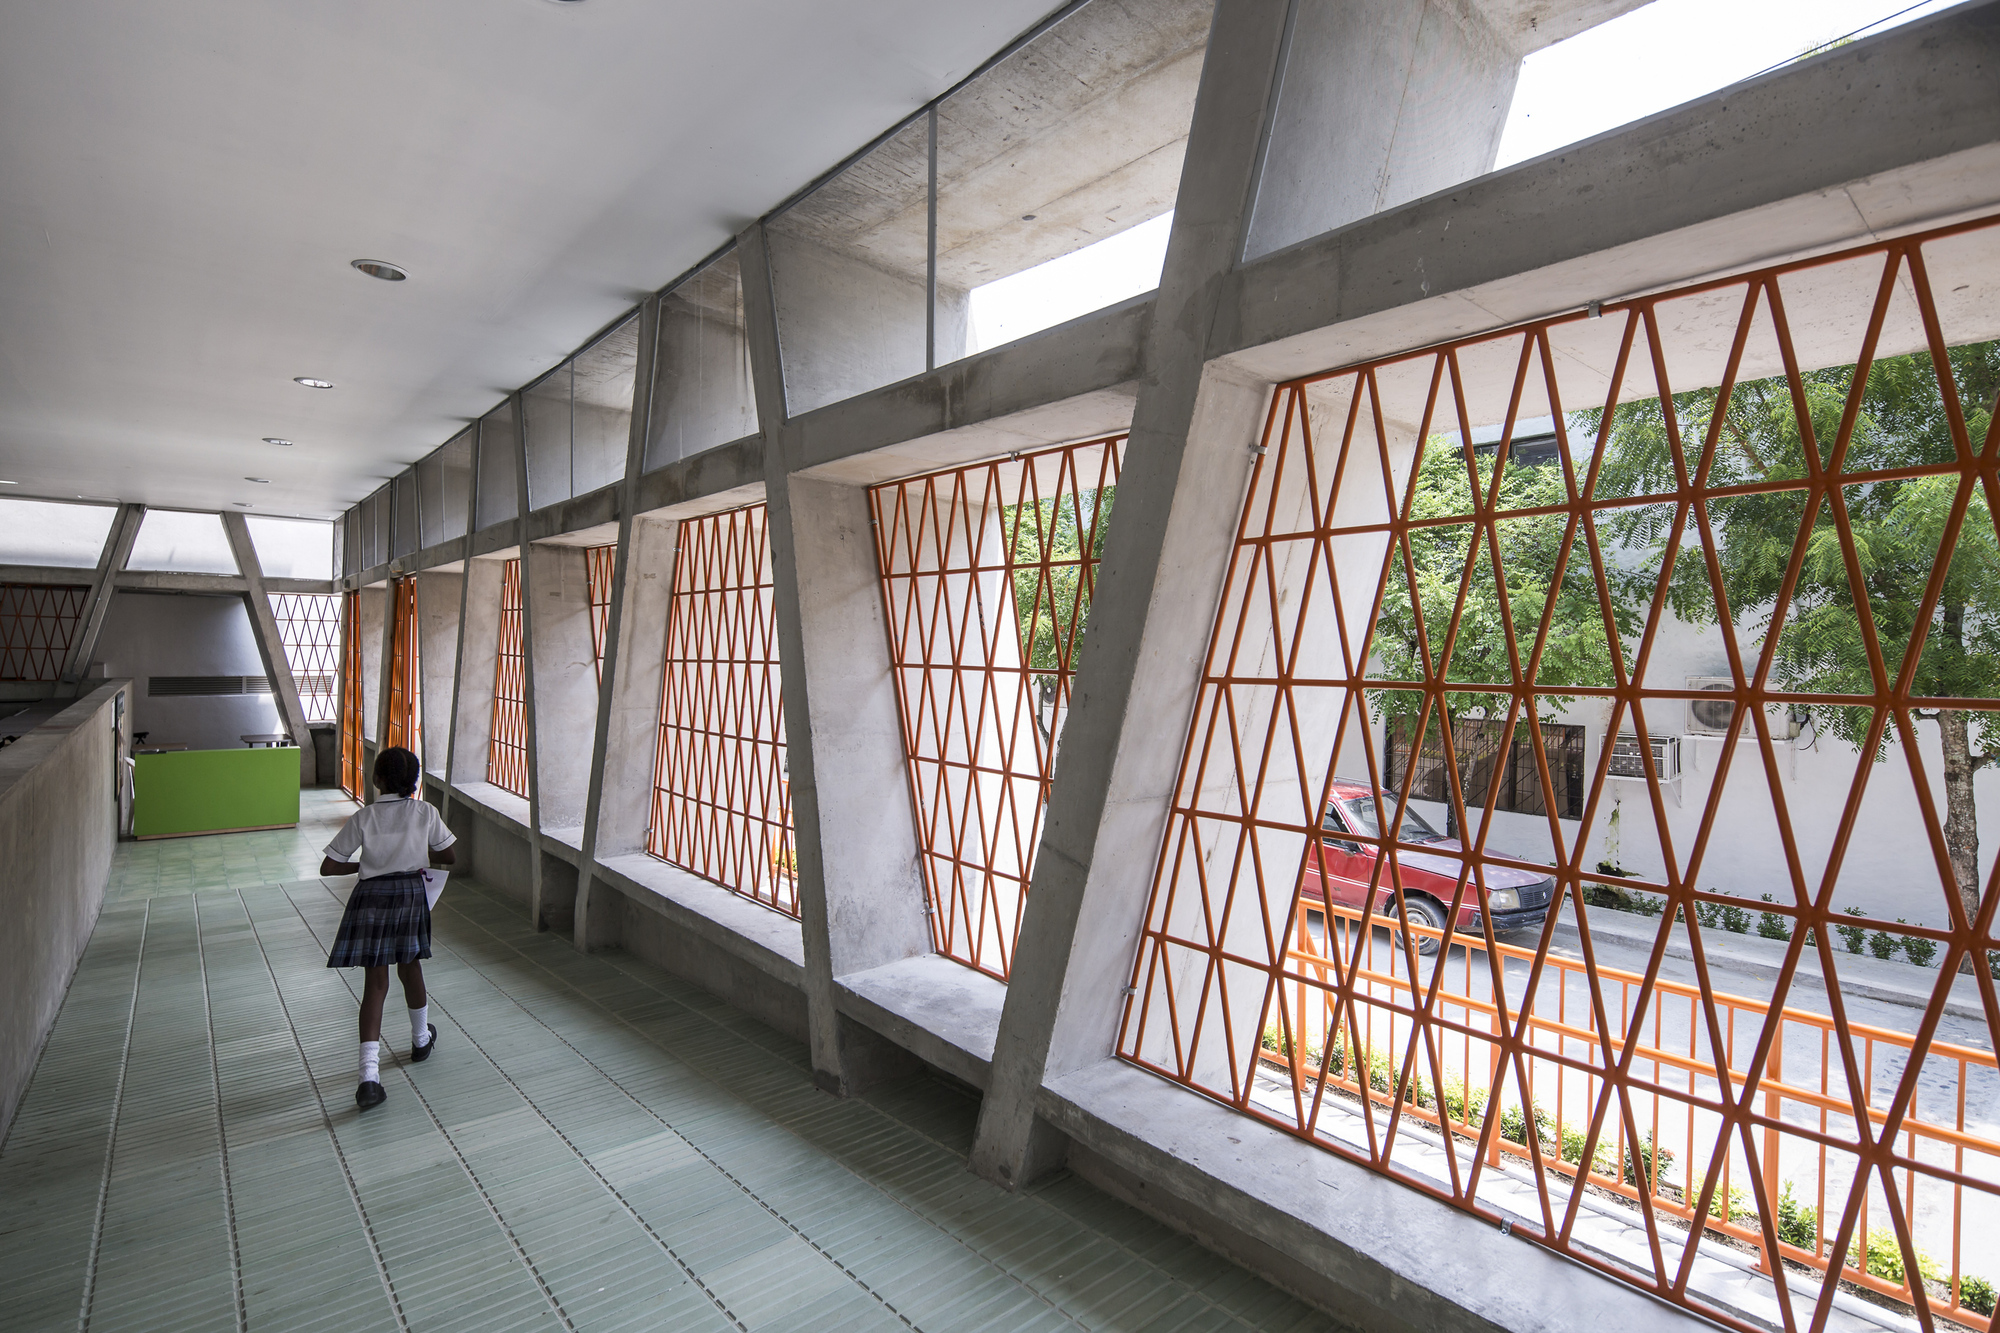 Gallery of mi yuma educational park plan b arquitectos 1 for Edificios educativos arquitectura